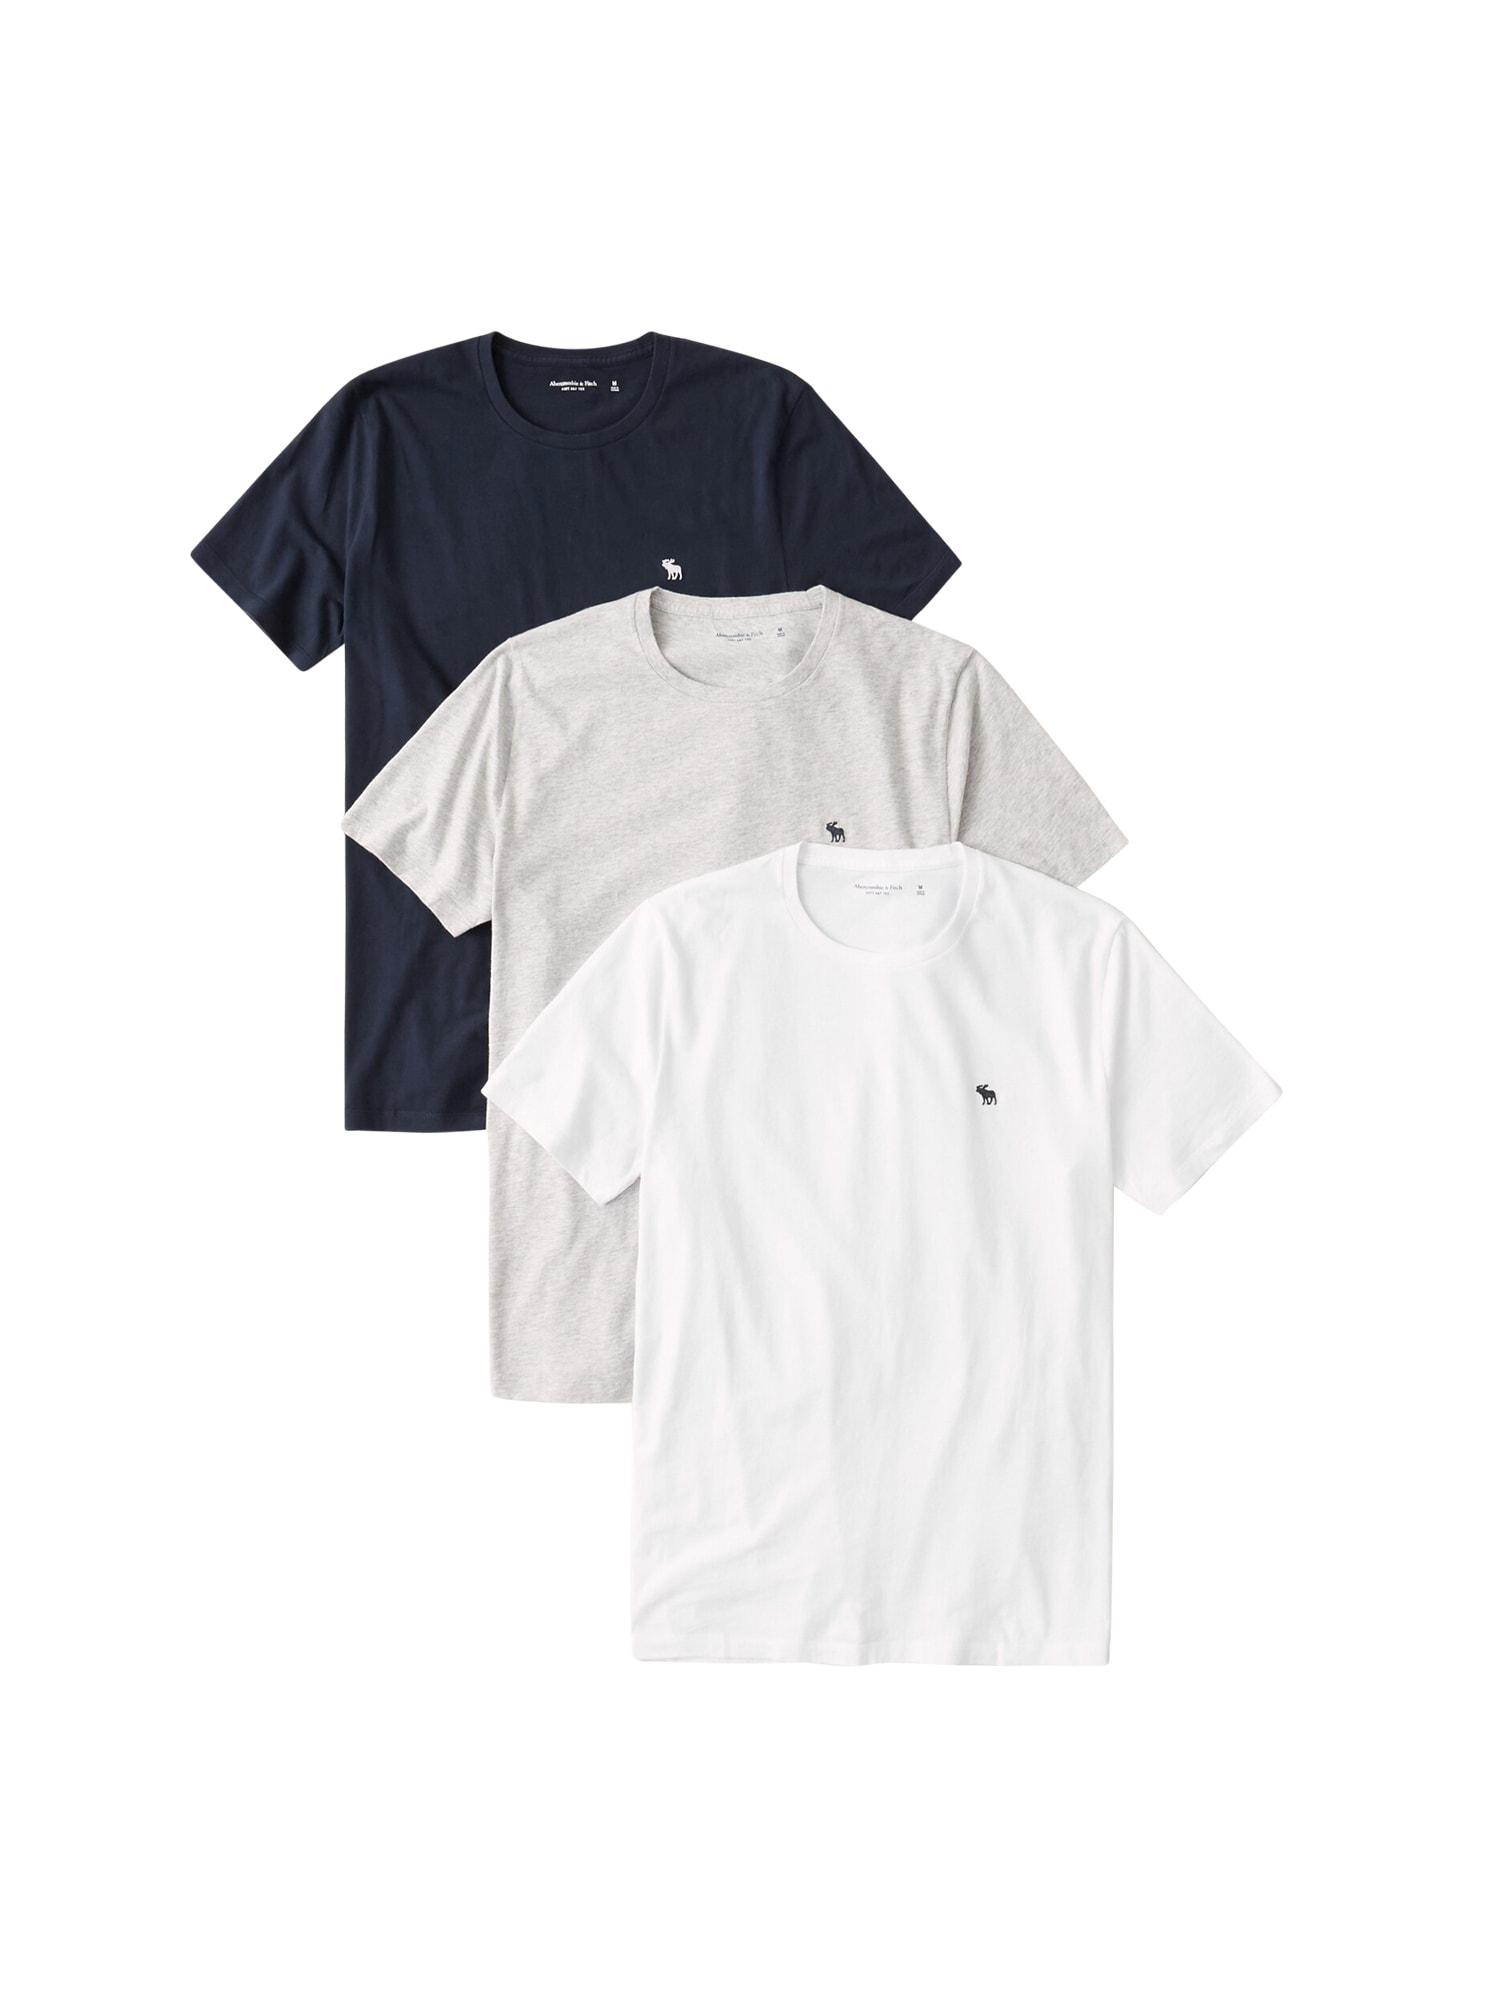 Abercrombie & Fitch Marškinėliai tamsiai mėlyna / balta / pilka